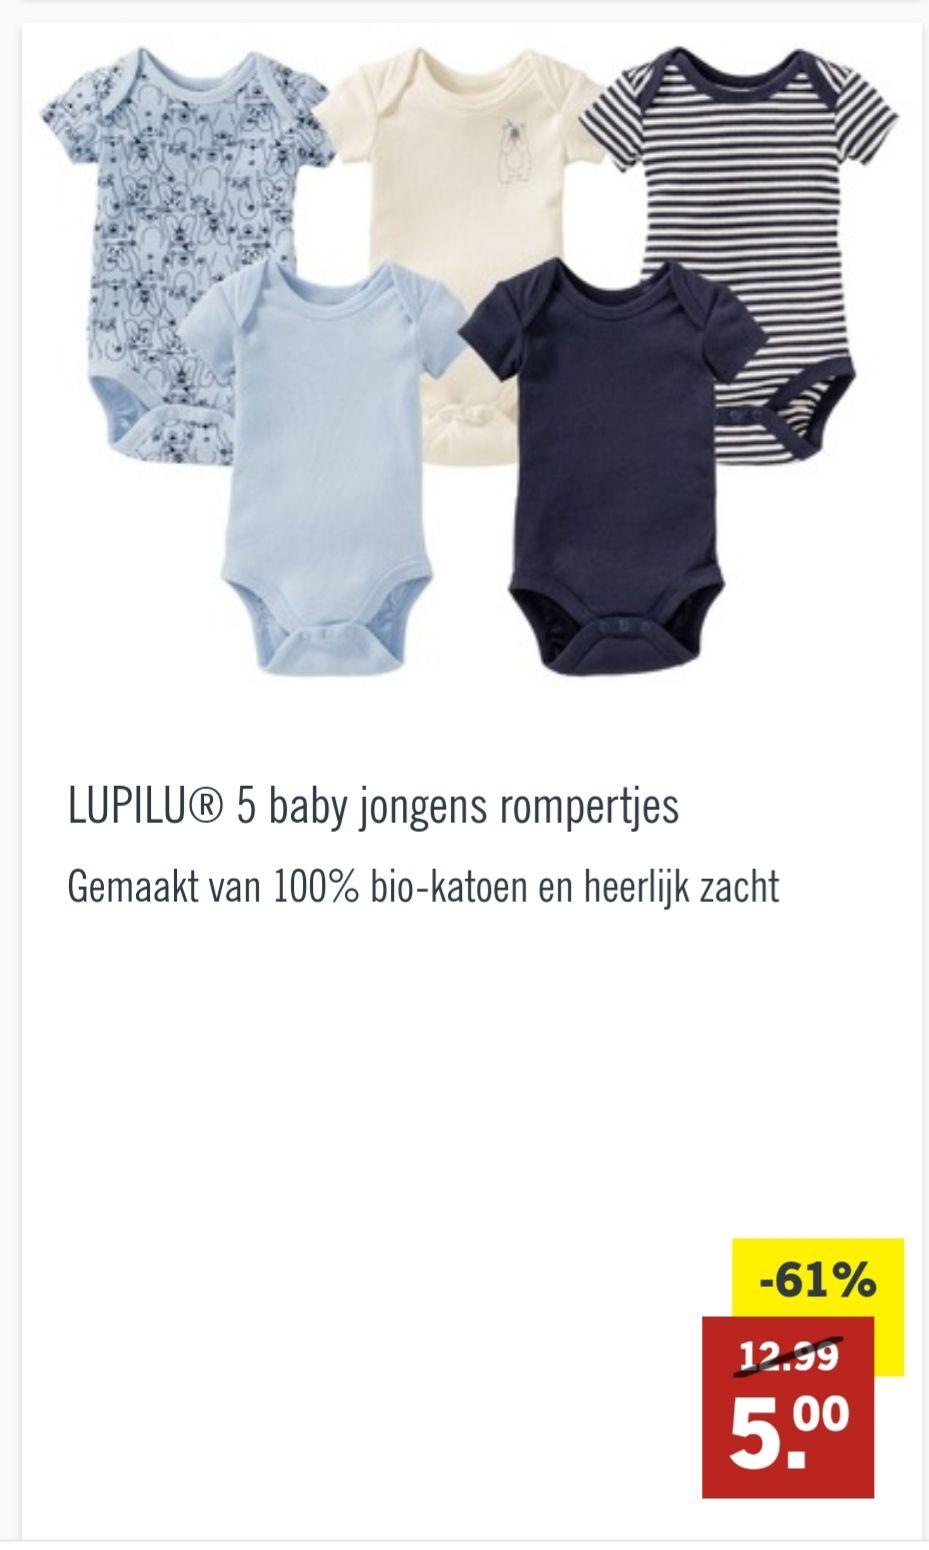 Lidl babykleding aanbieding